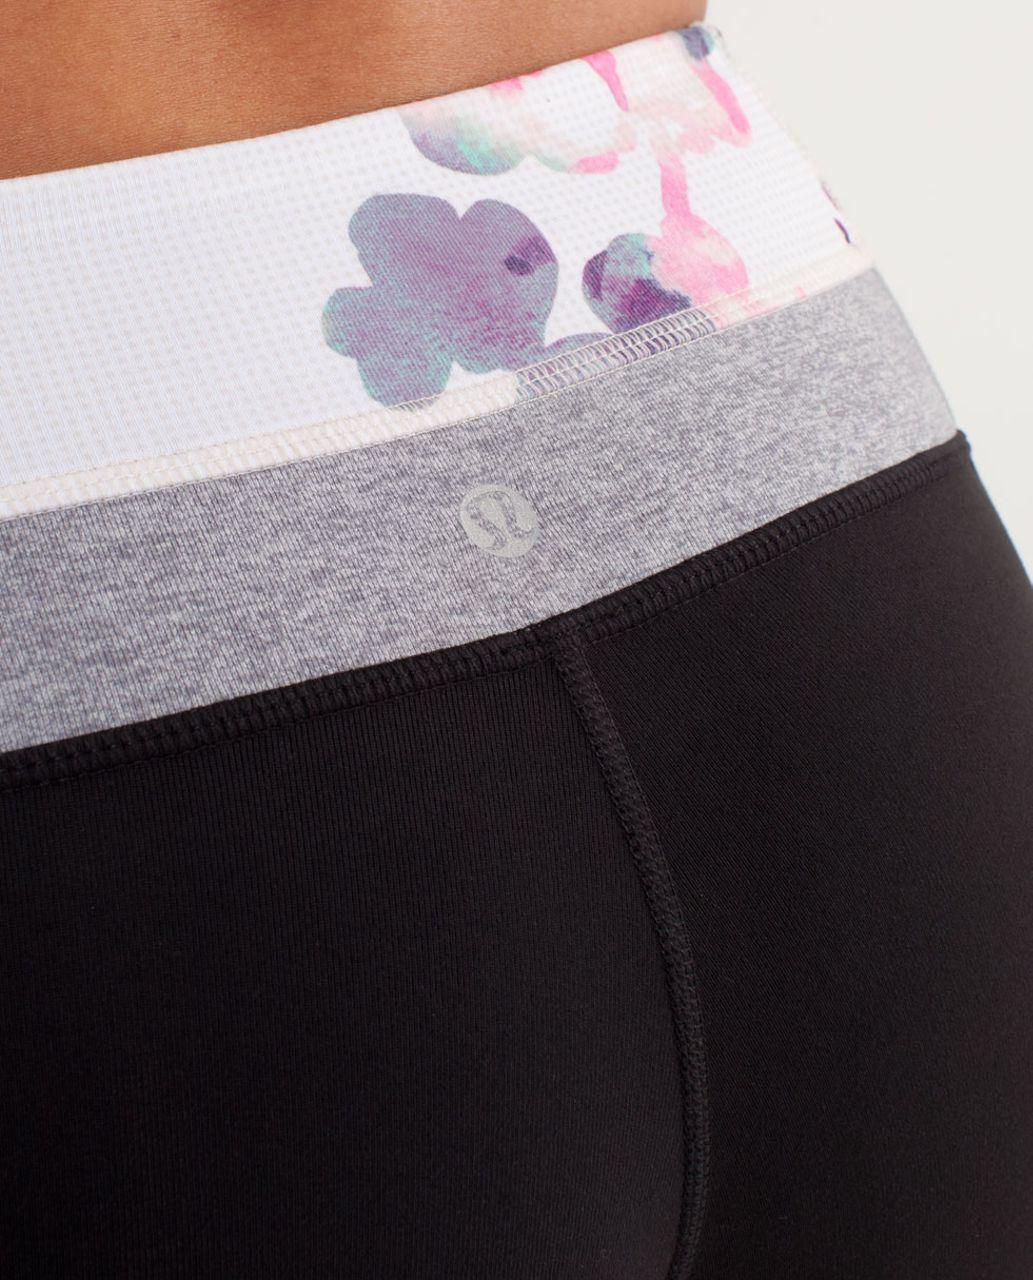 Lululemon Groove Pant (Tall) - Black / Blurred Blossoms Multi Colour / Heathered Fossil